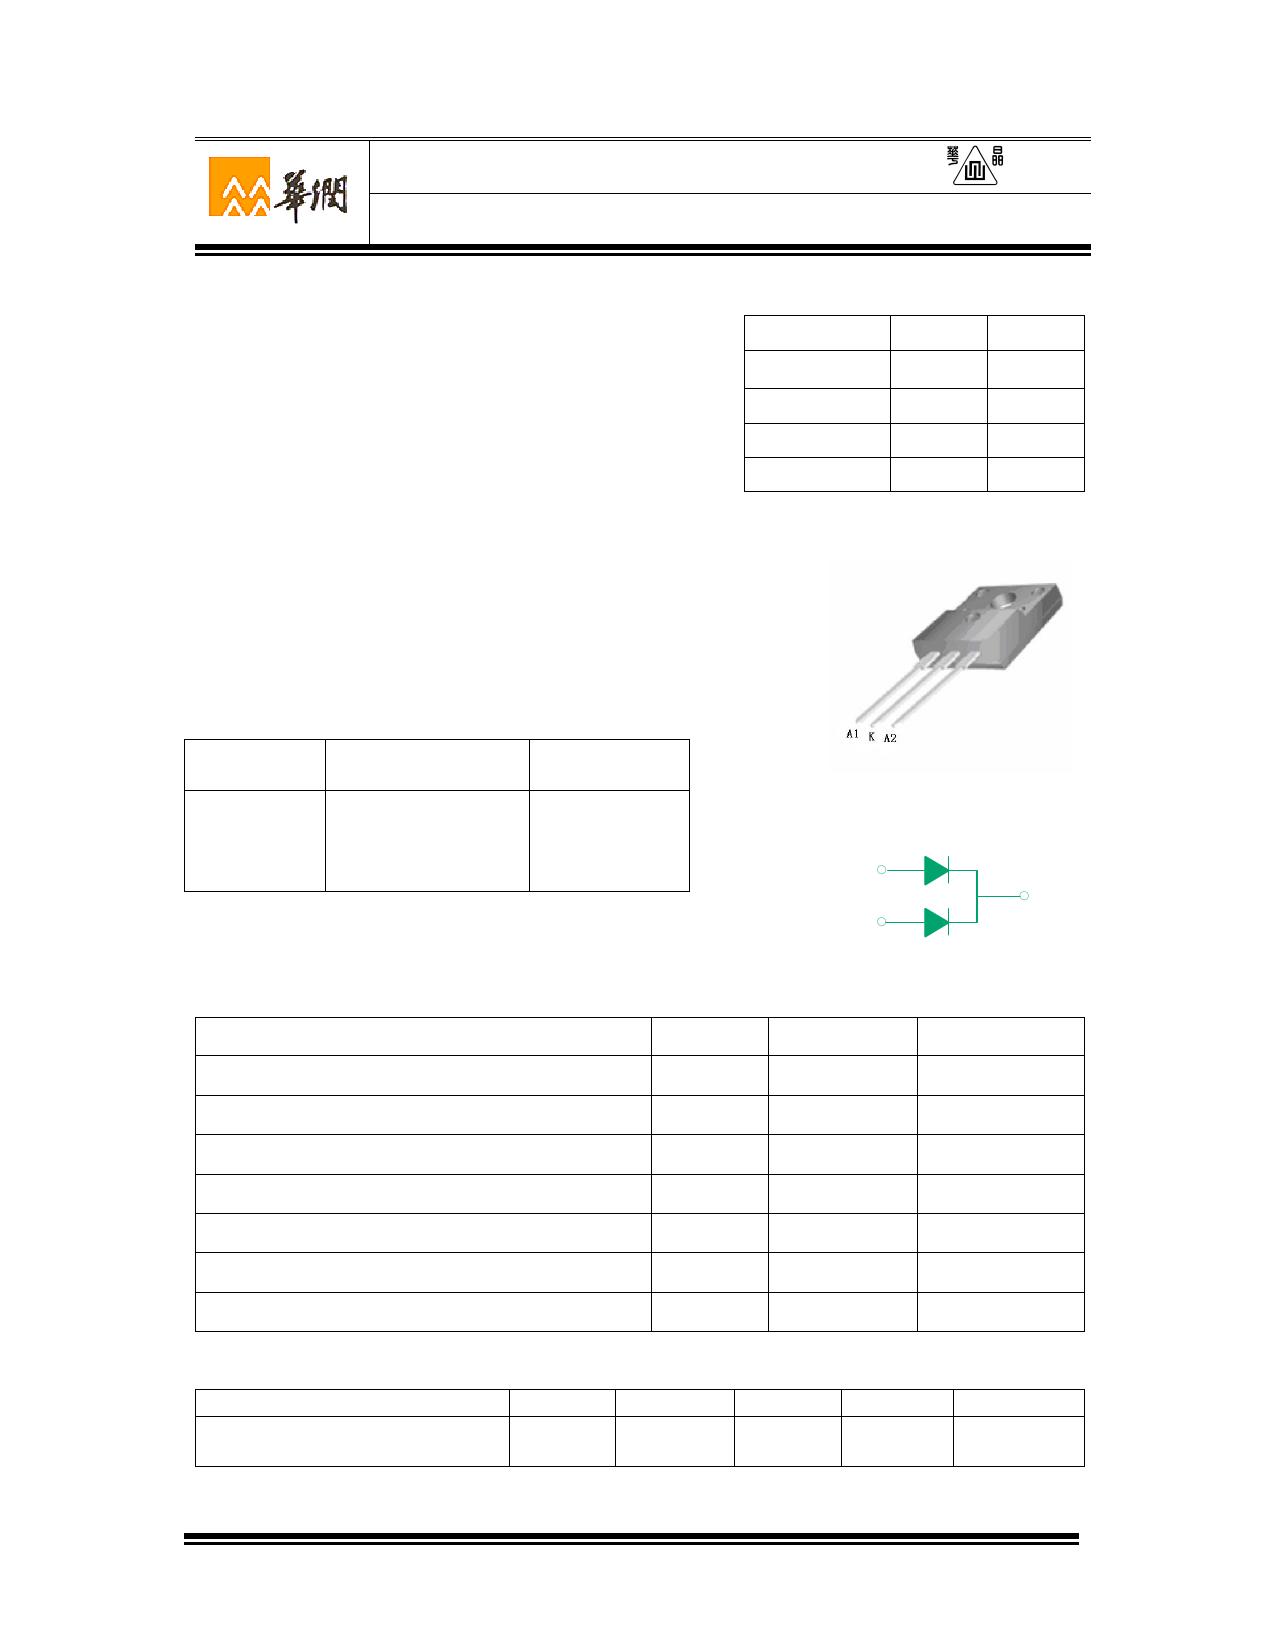 2CR164A9D Datasheet, 2CR164A9D PDF,ピン配置, 機能